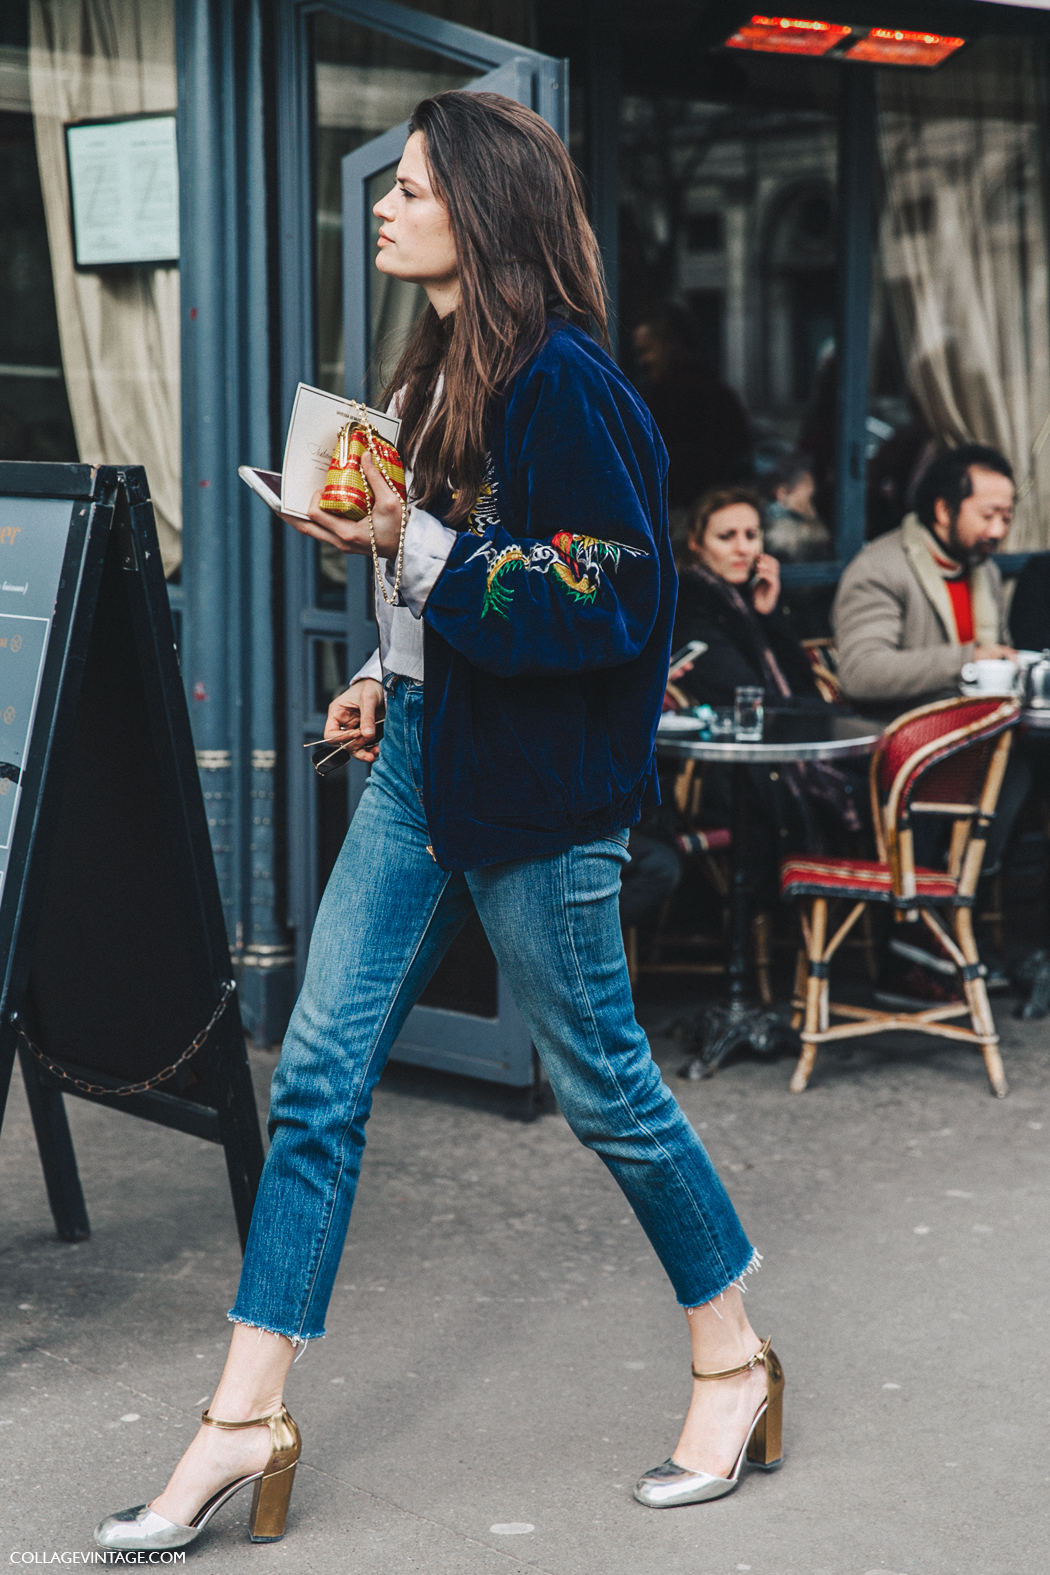 PFW-Paris_Fashion_Week_Fall_2016-Street_Style-Collage_Vintage-Alessandra-_Codinha-Velvet_Bomber-1